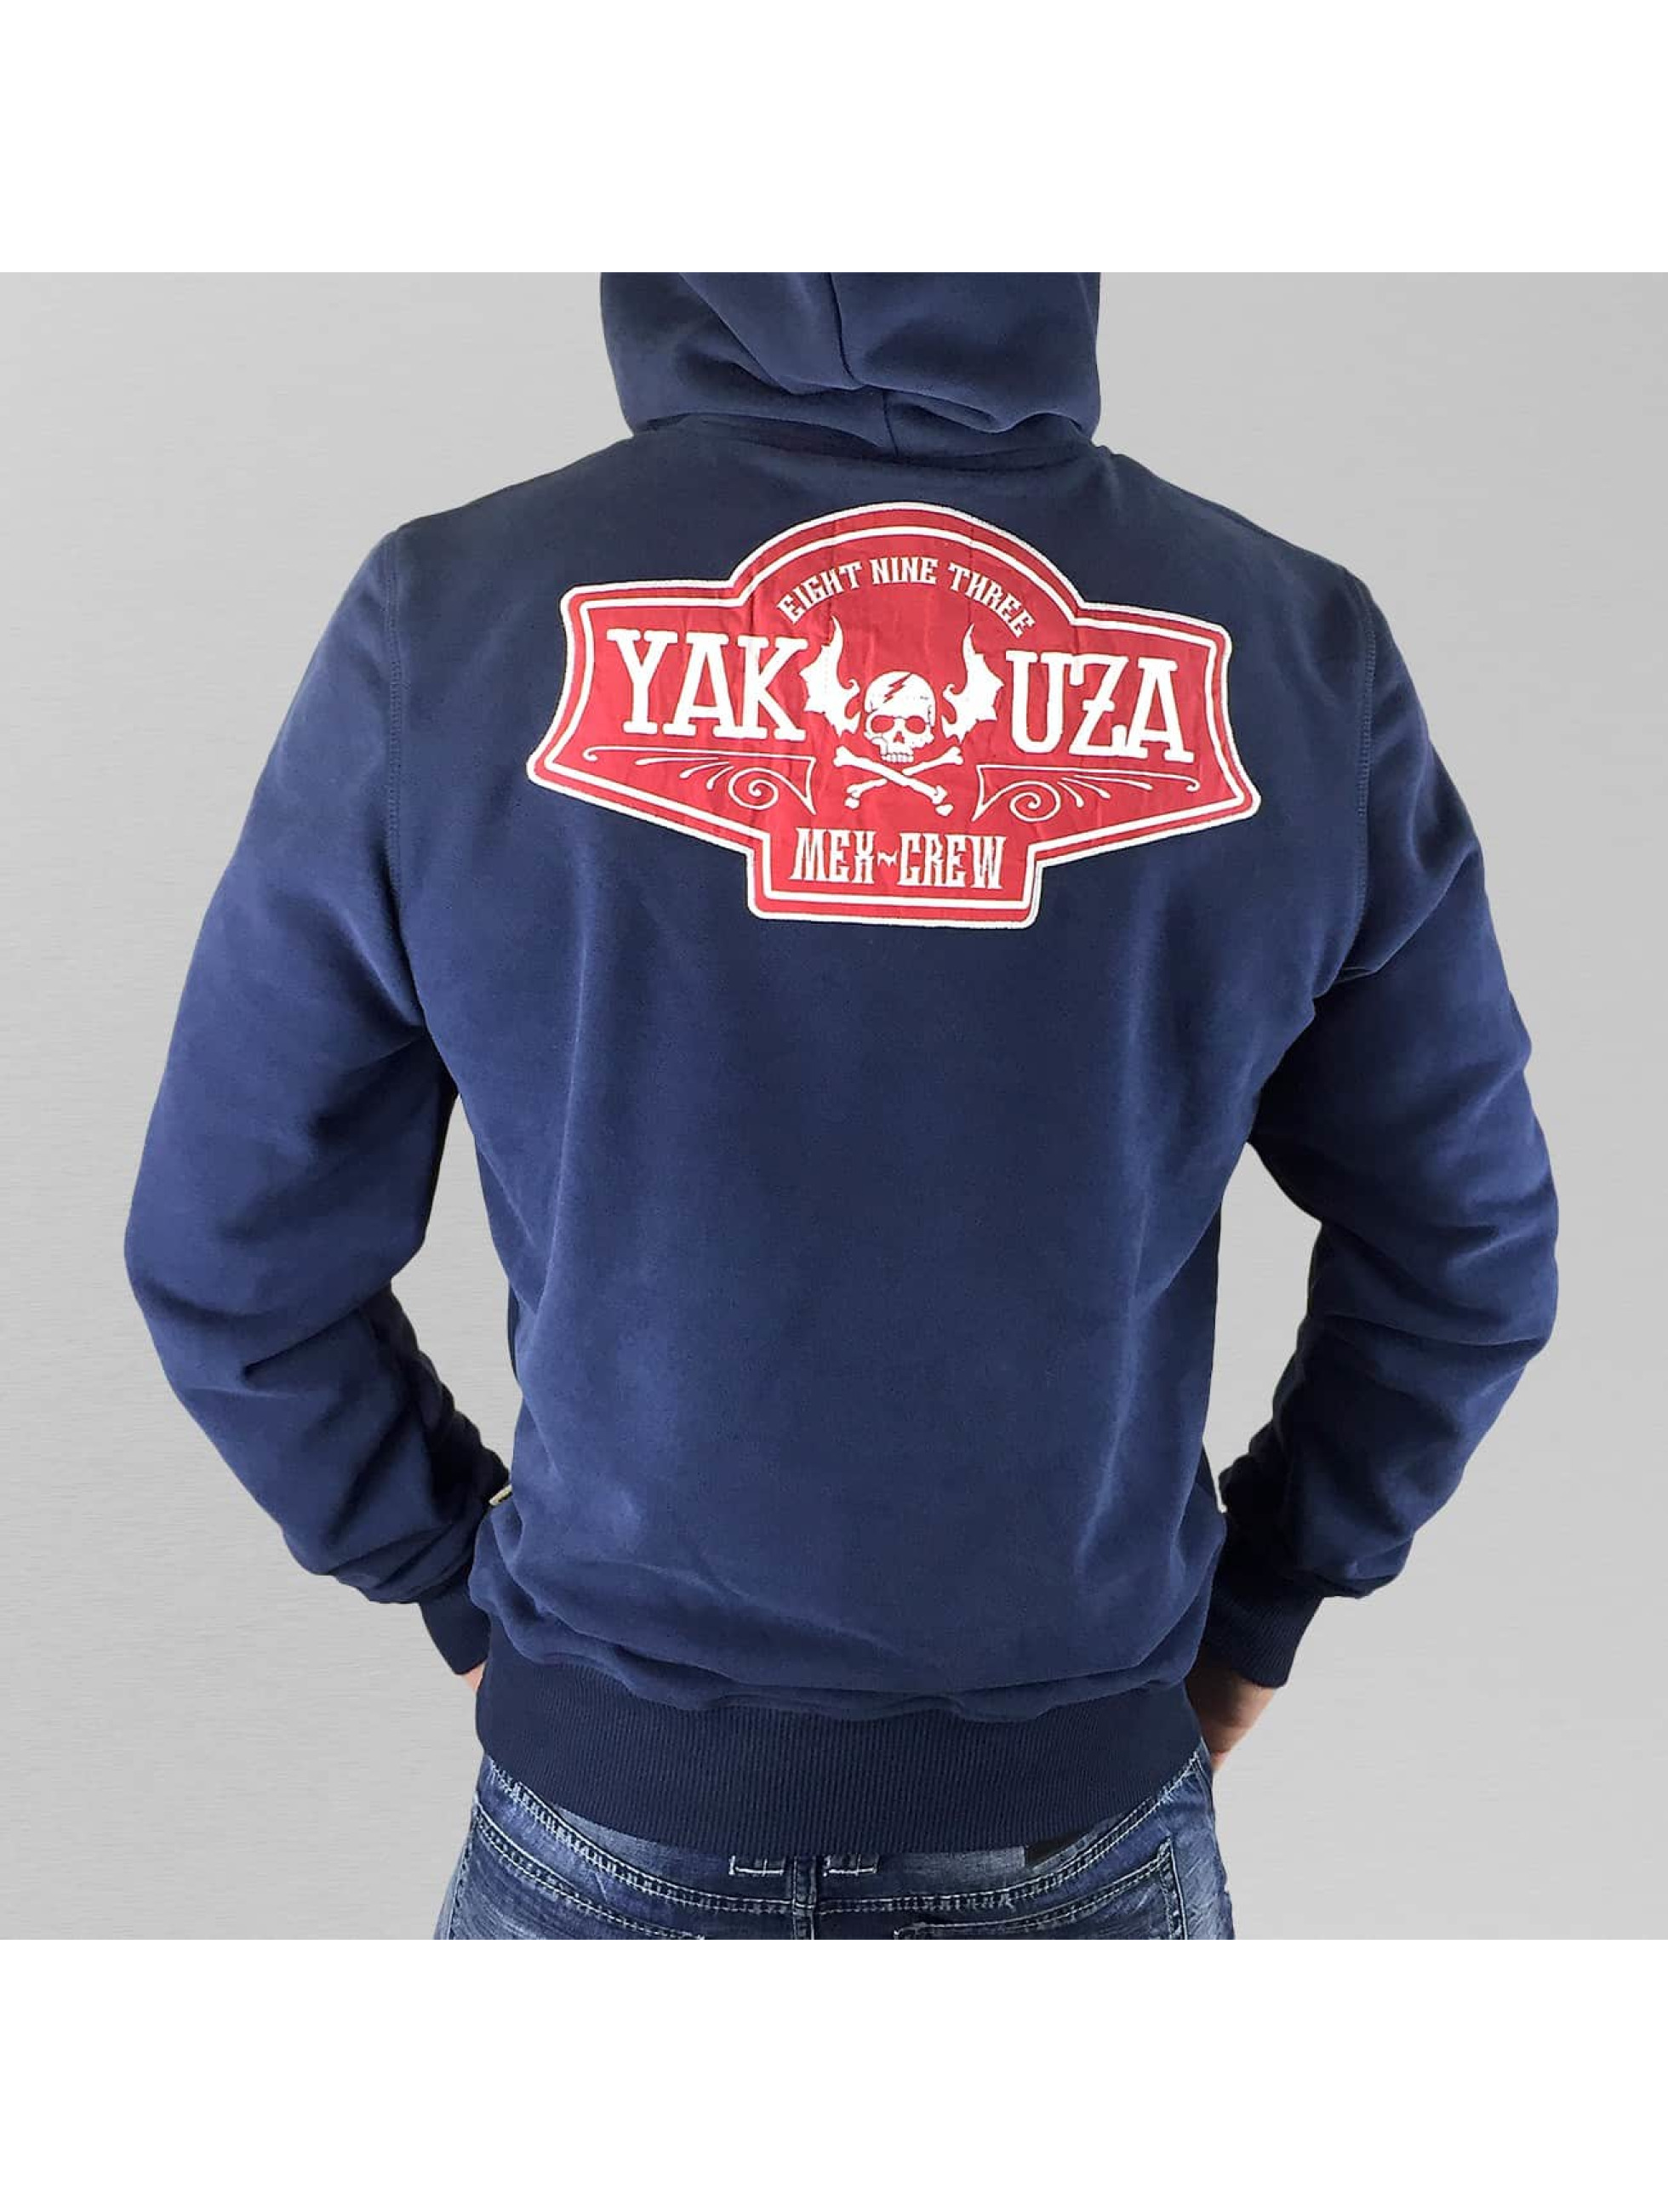 Yakuza Mikiny Mex-Crew VO2 indigo